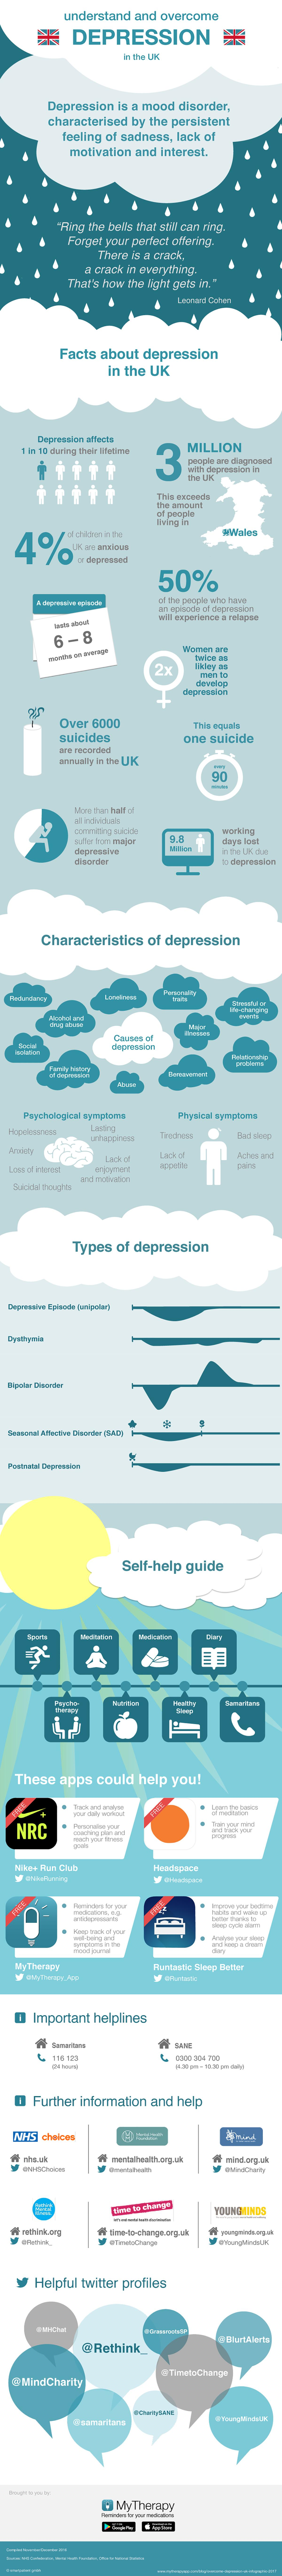 infographic_depression_uk_2017